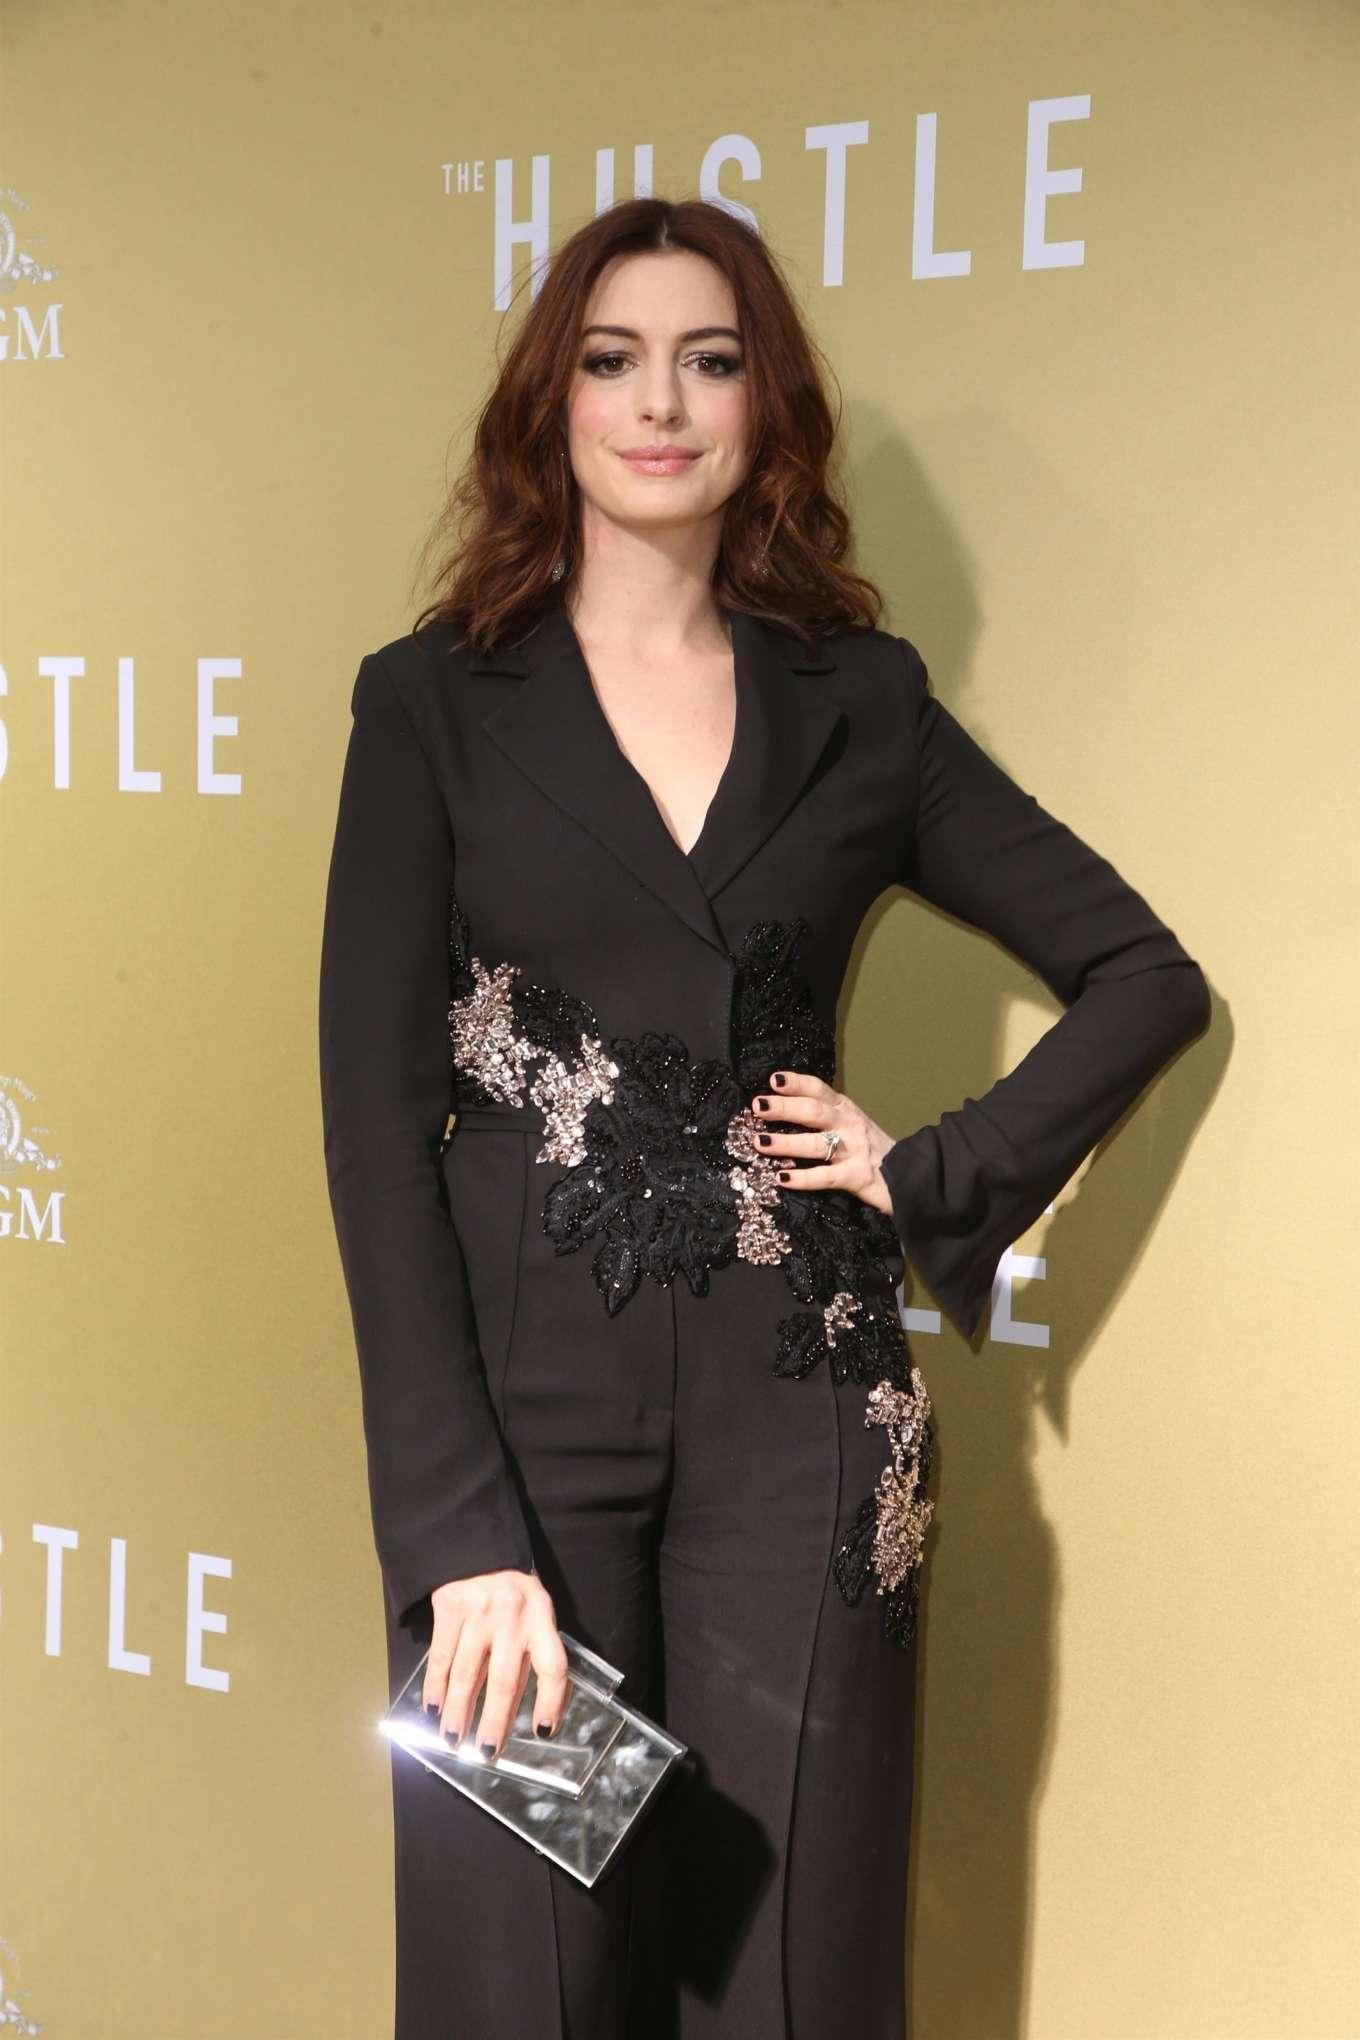 Anne Hathaway 2019 : Anne Hathaway: The Hustle LA Premiere -01